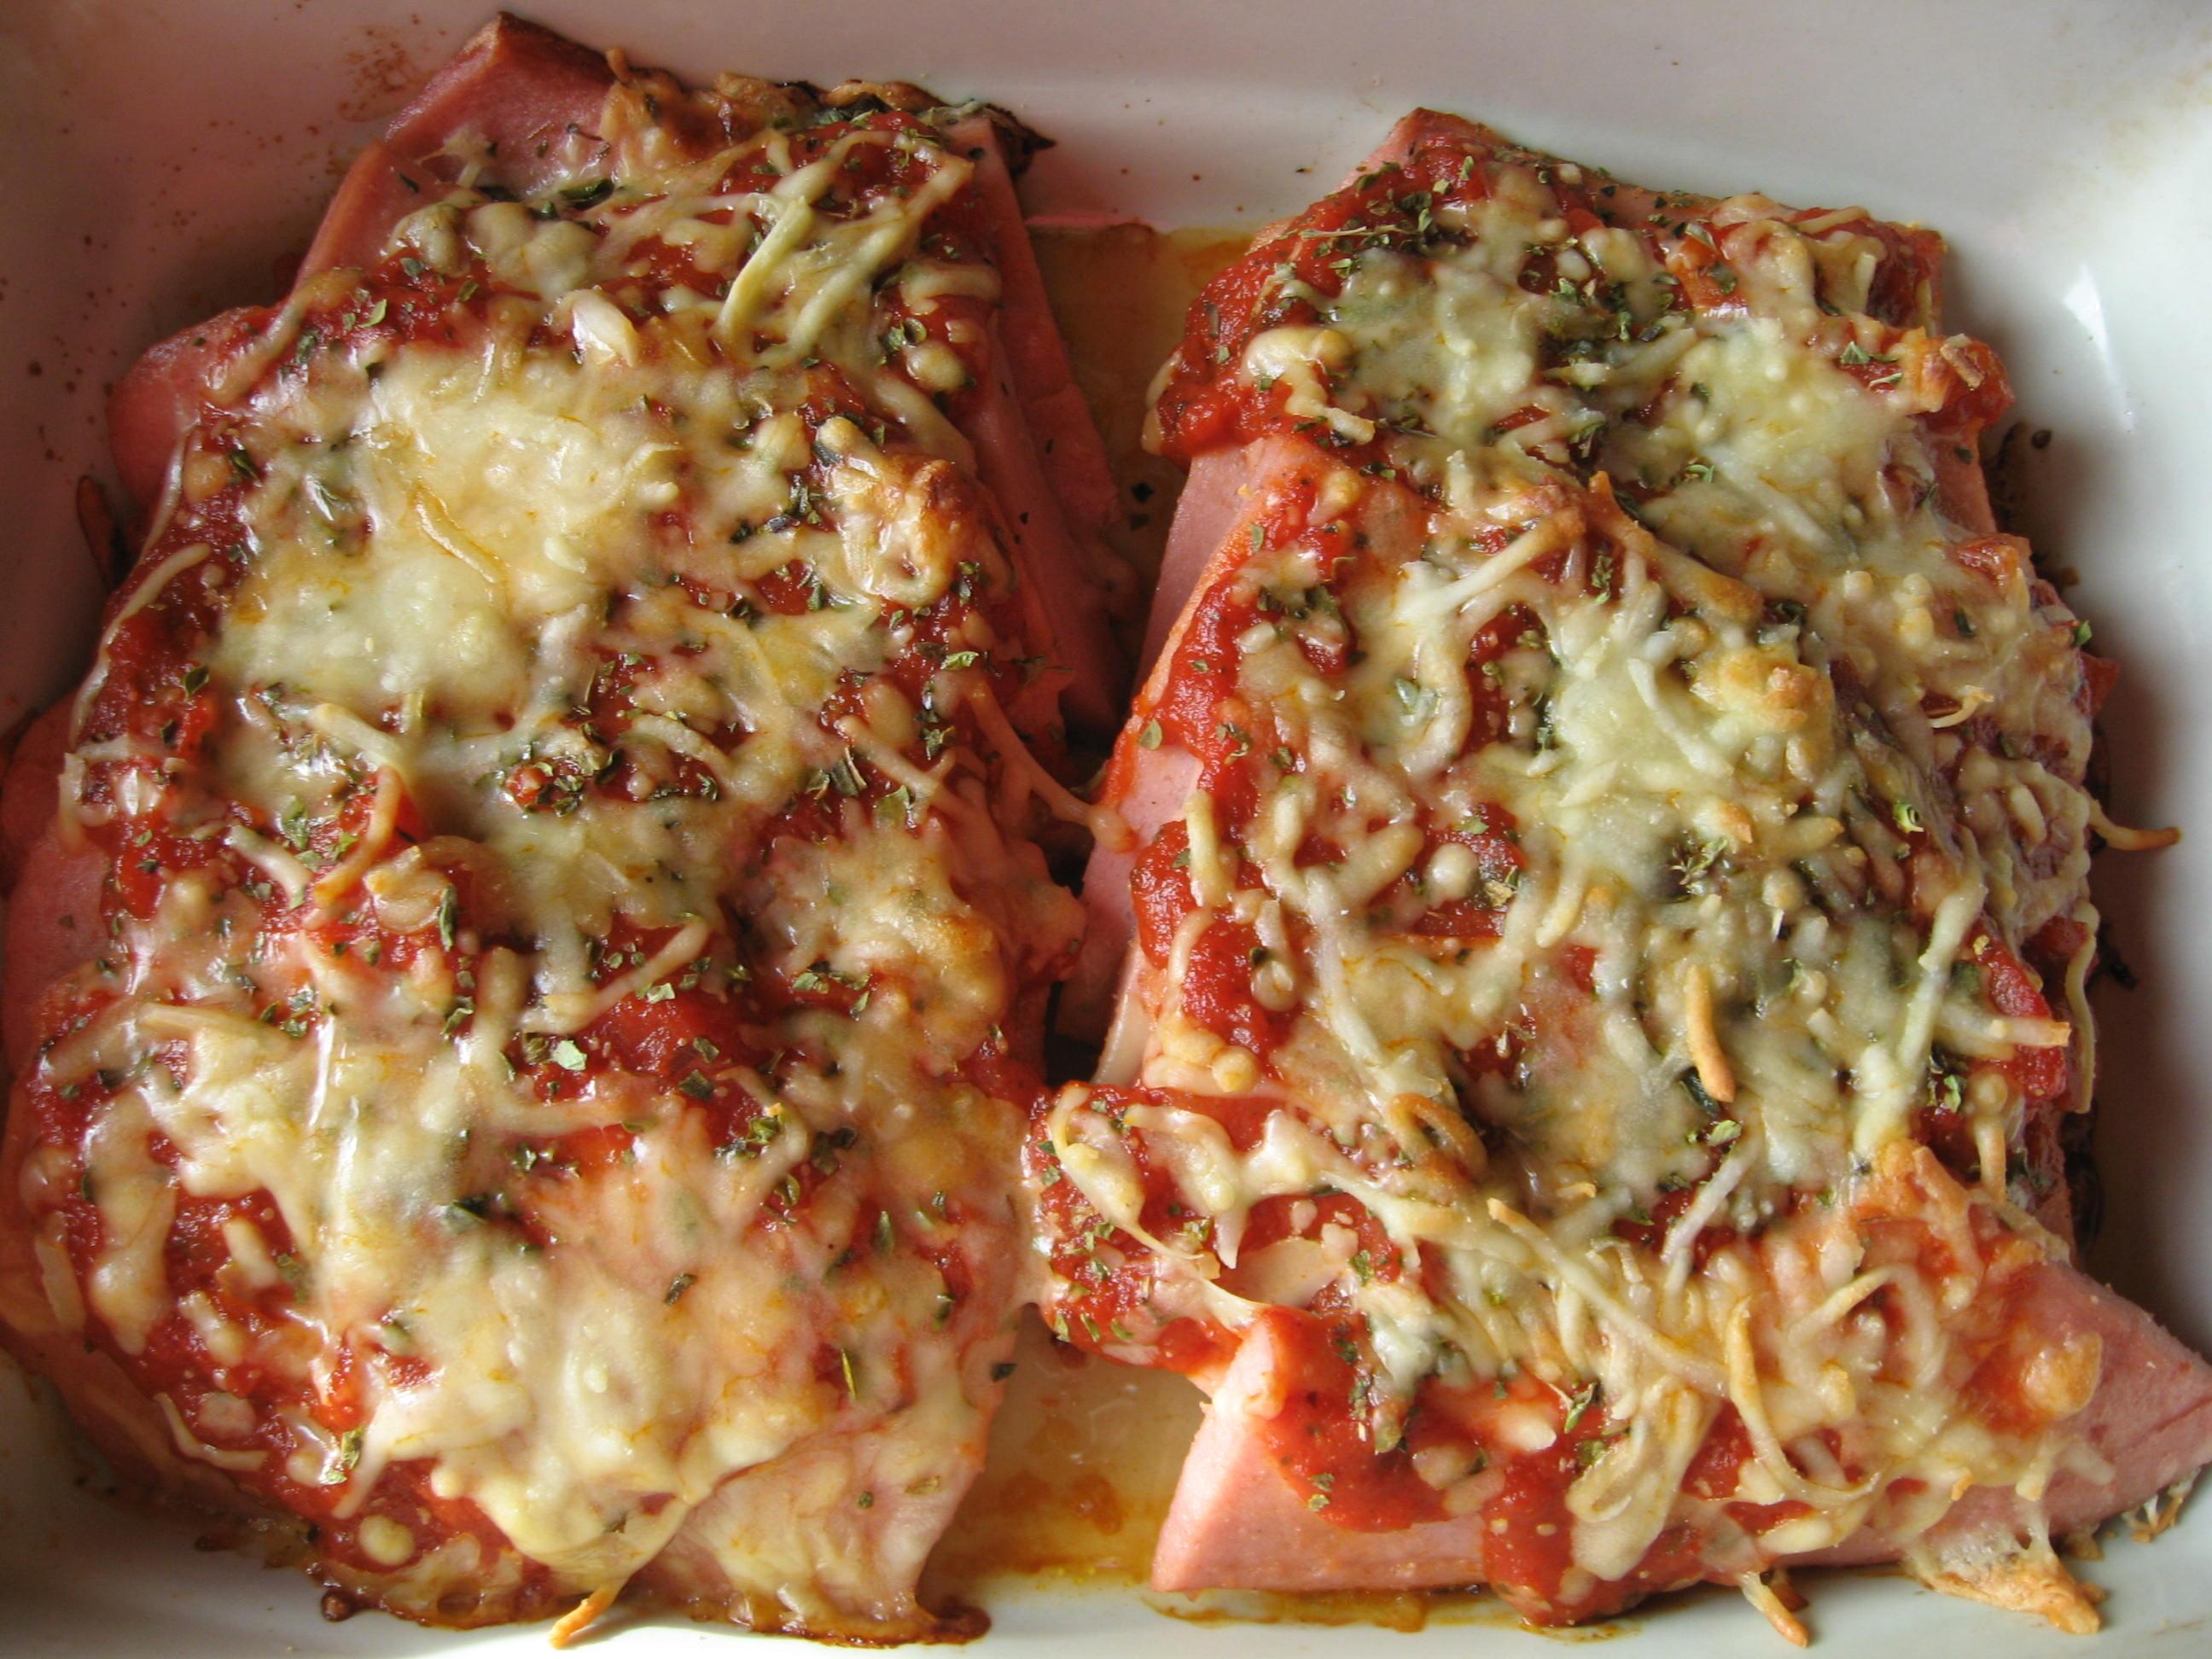 falukorv pizzasmak